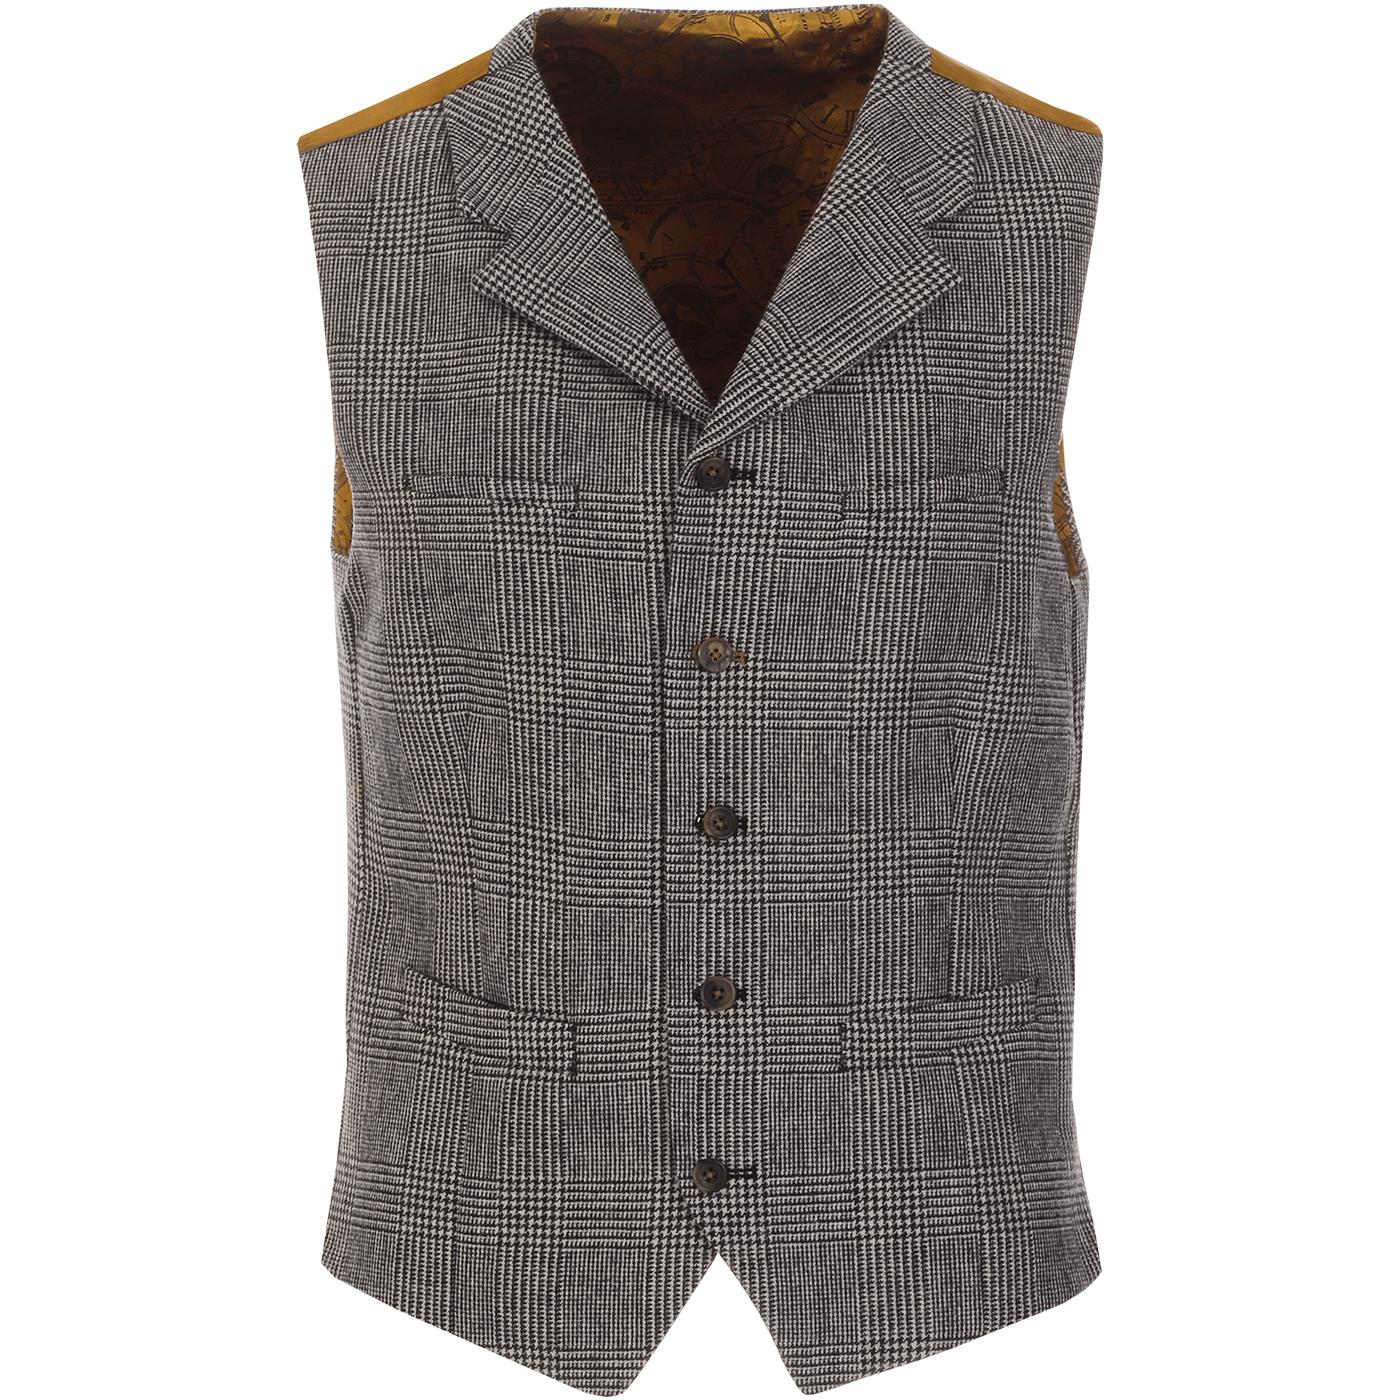 GIBSON LONDON Retro Mod POW Check Lapel Waistcoat